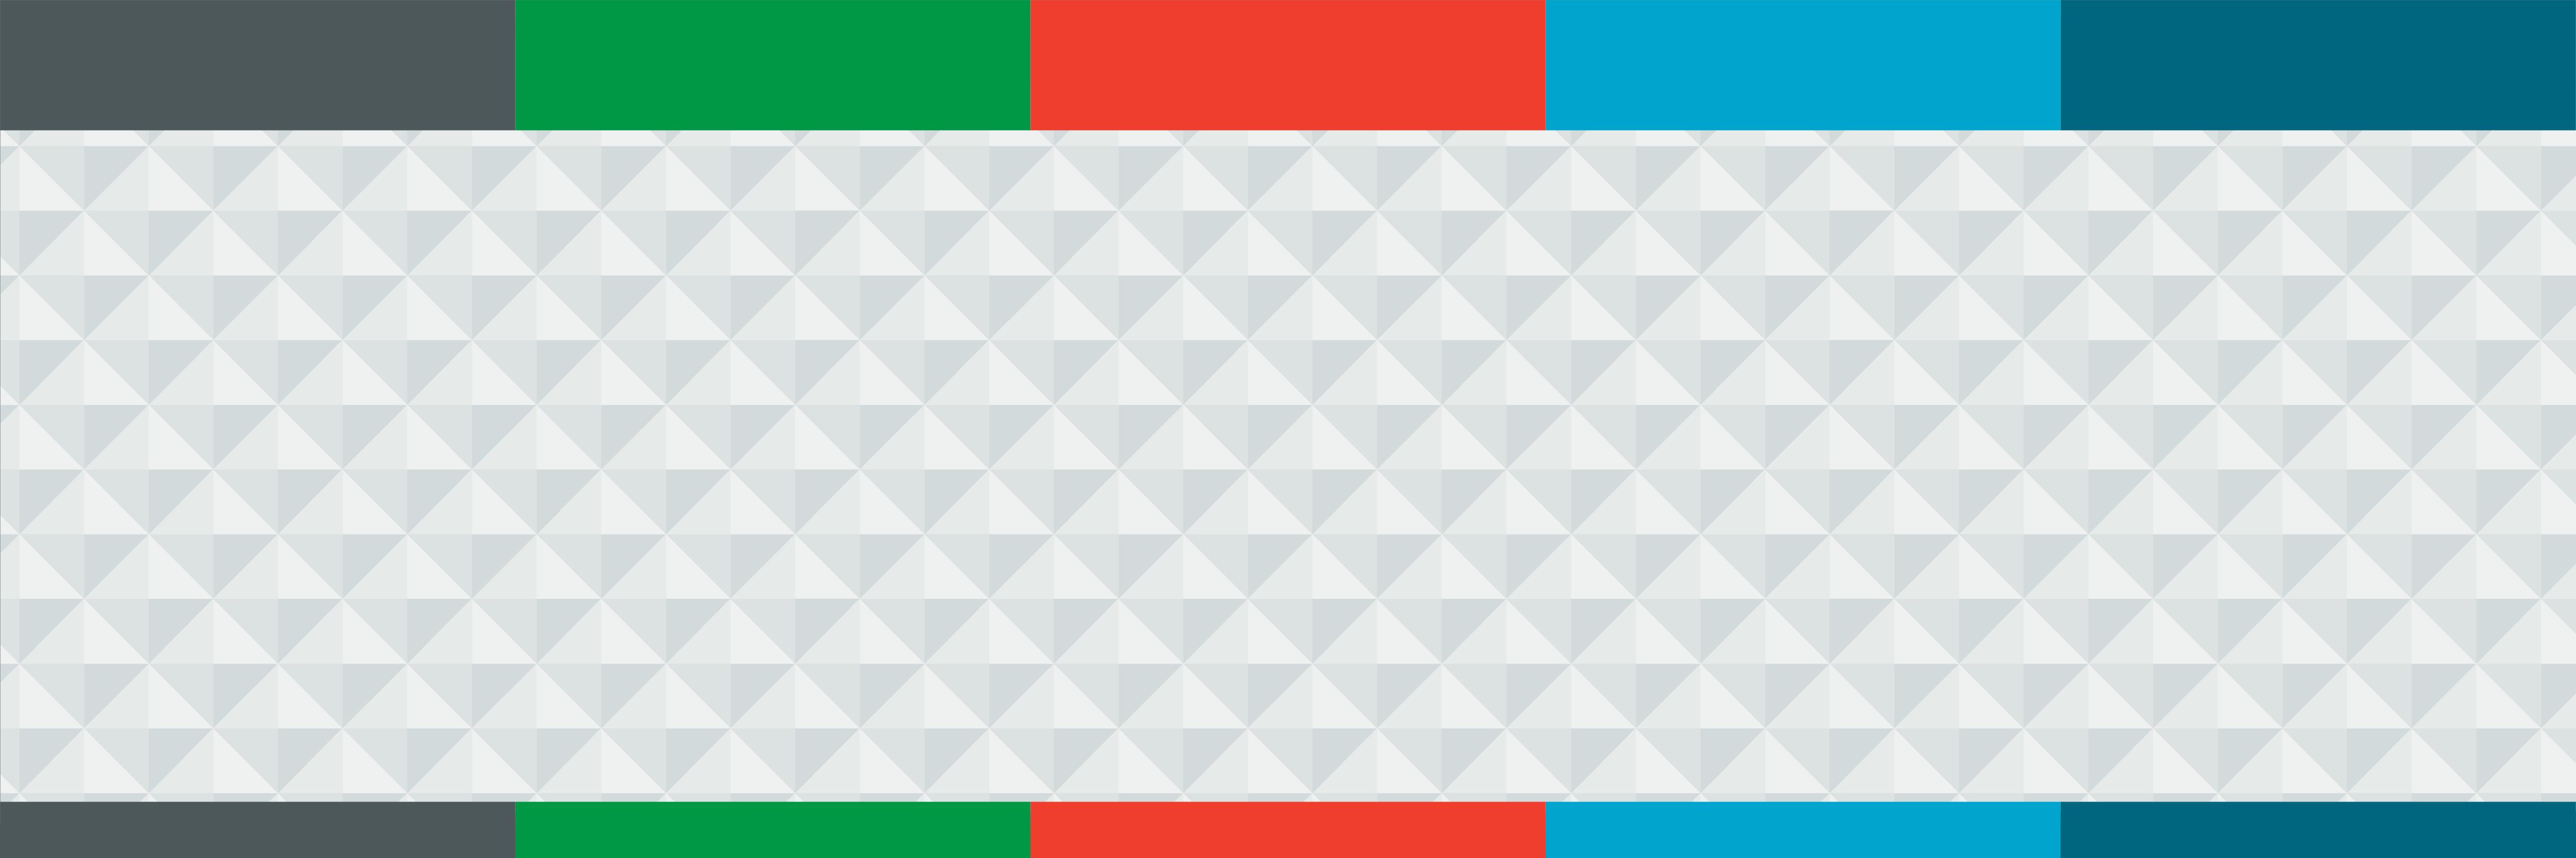 9935_WEB_Covisum_tax-cuts-web-banner-JK-1.png